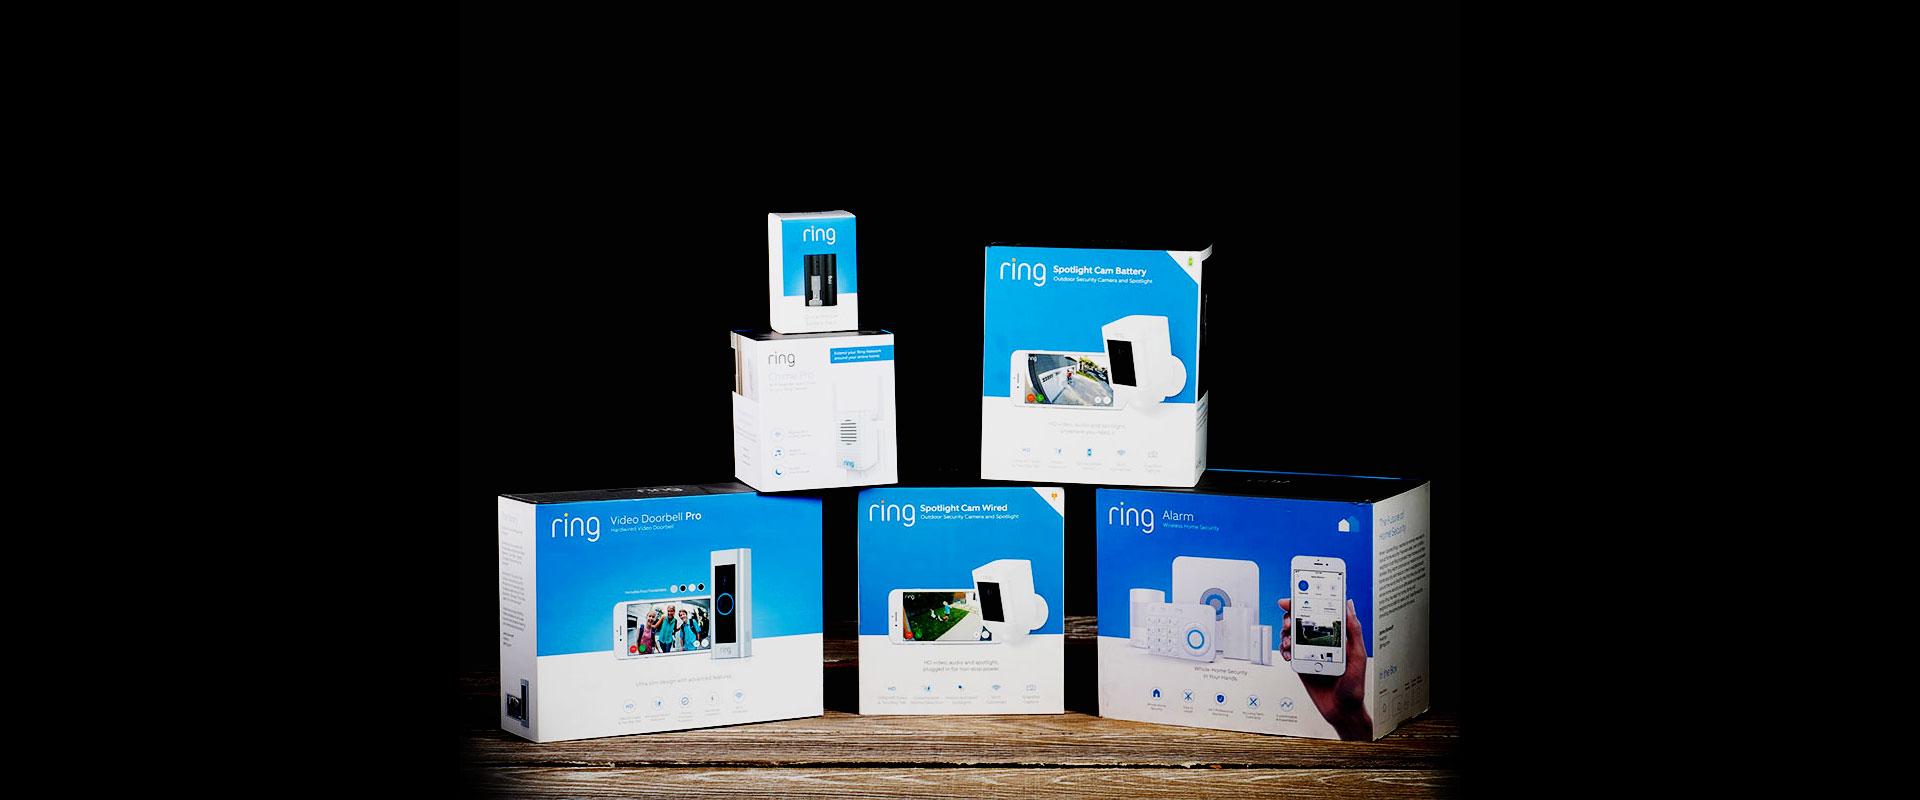 Petes-Hardware-ring-security